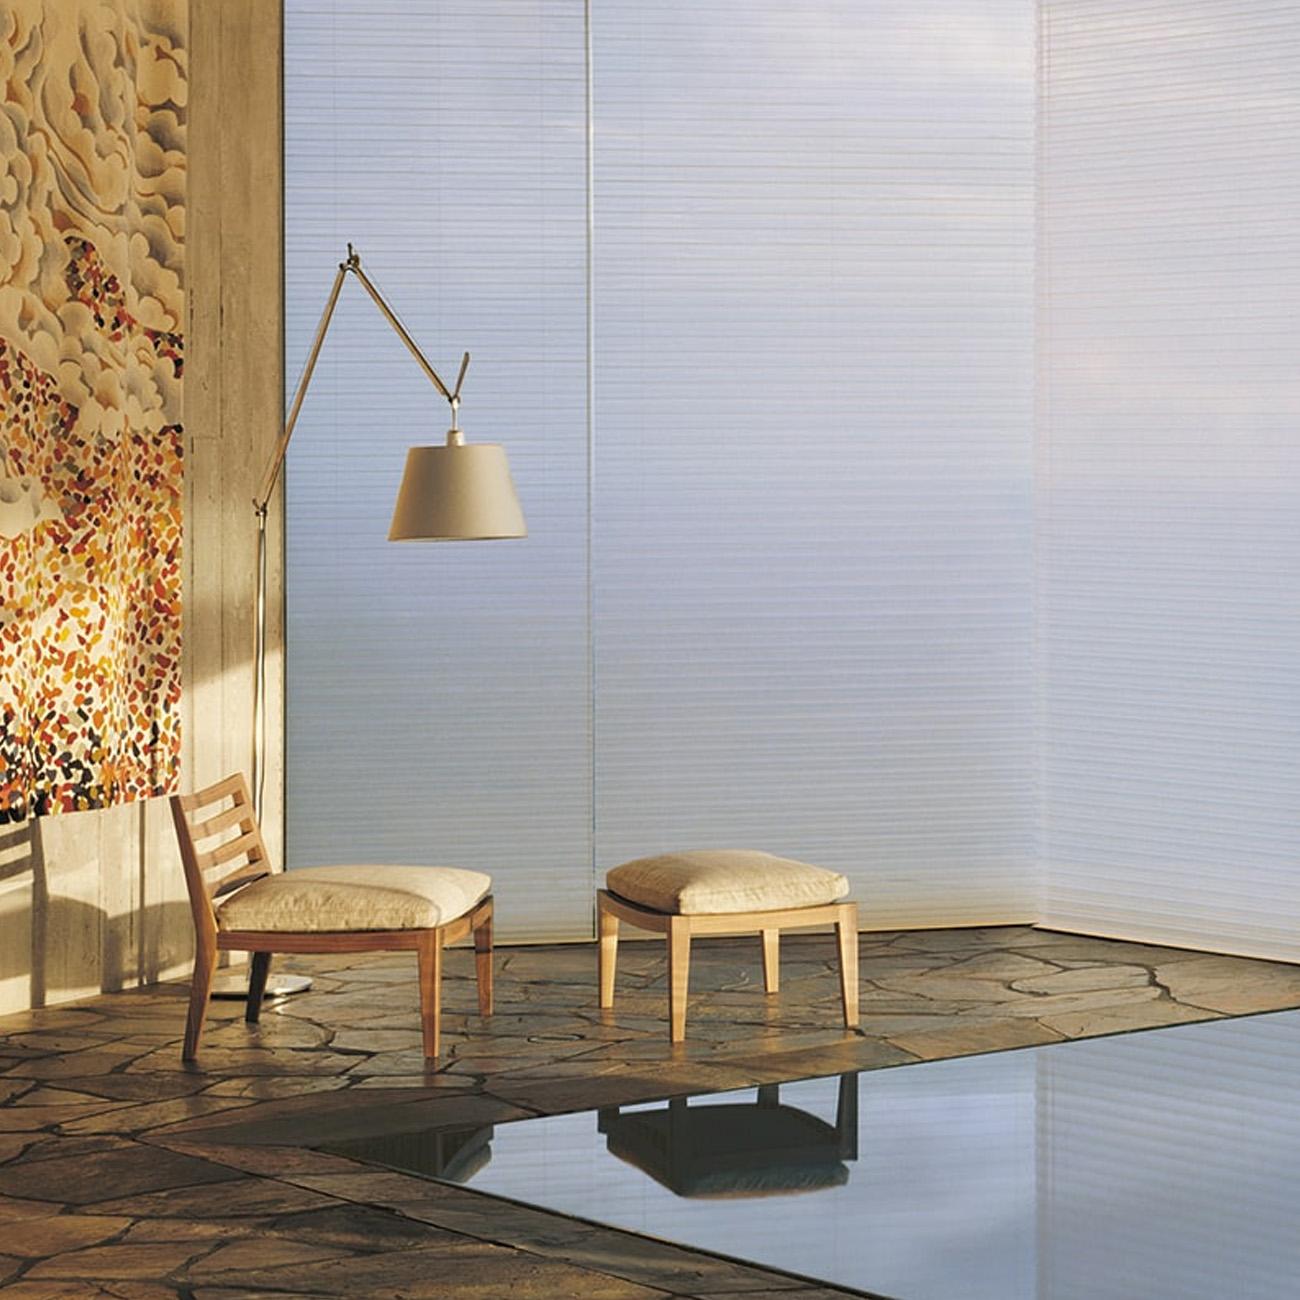 reflective glass walls